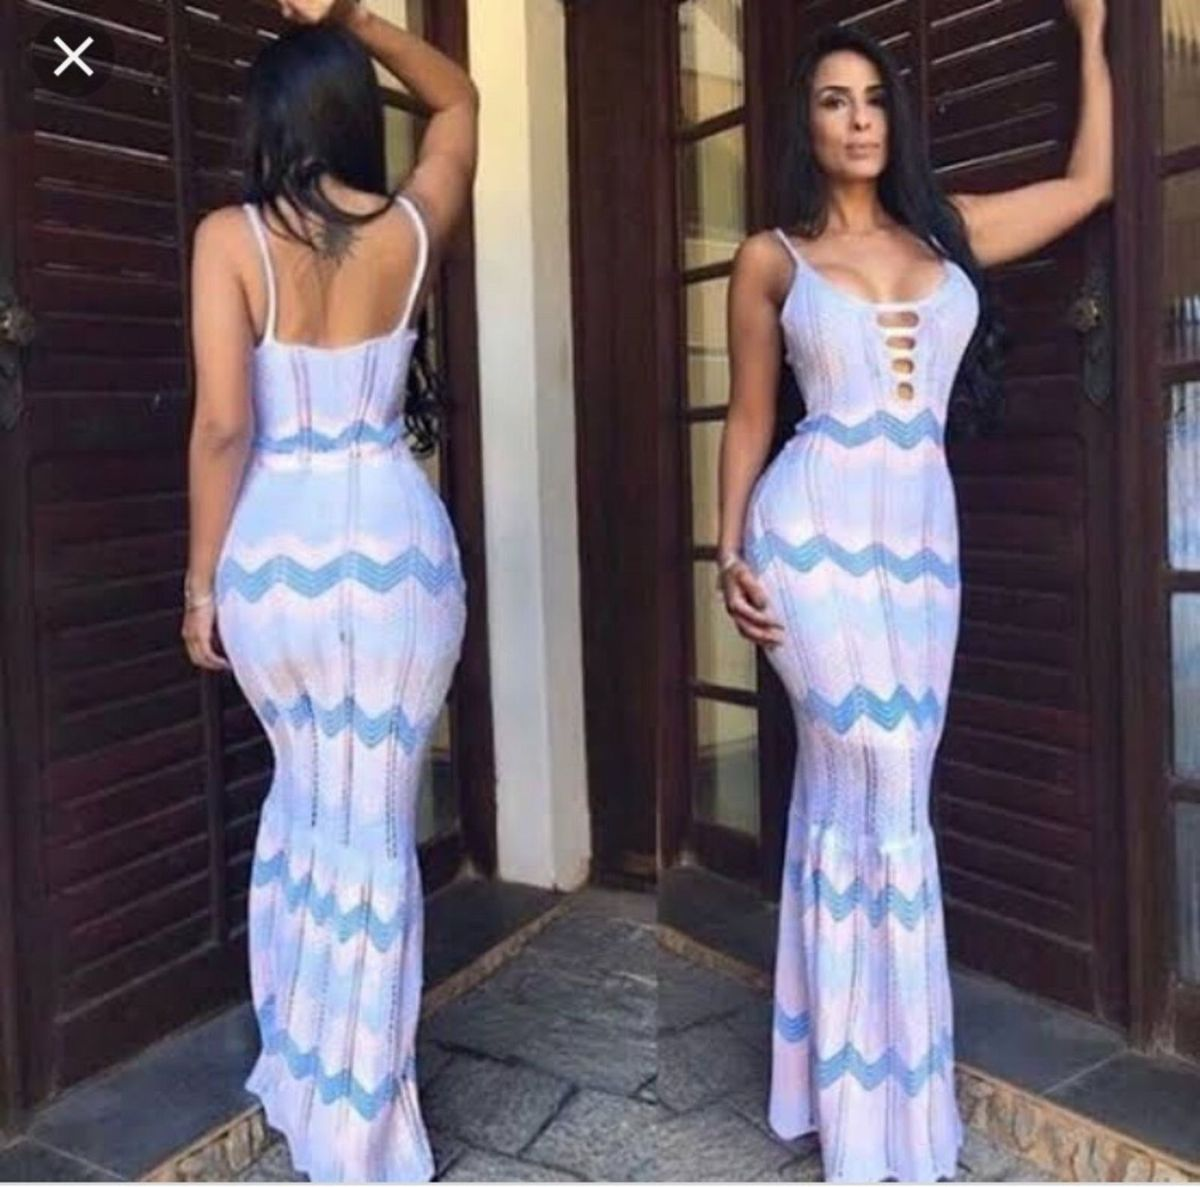 0ac56fe9499d vestido longo tricô - vestidos leblon.  Czm6ly9wag90b3muzw5qb2vplmnvbs5ici9wcm9kdwn0cy83ntk4ndexlznhmzczmmq4ndvlywe0ndvkm2q5njdmntljmdfmowzmlmpwzw